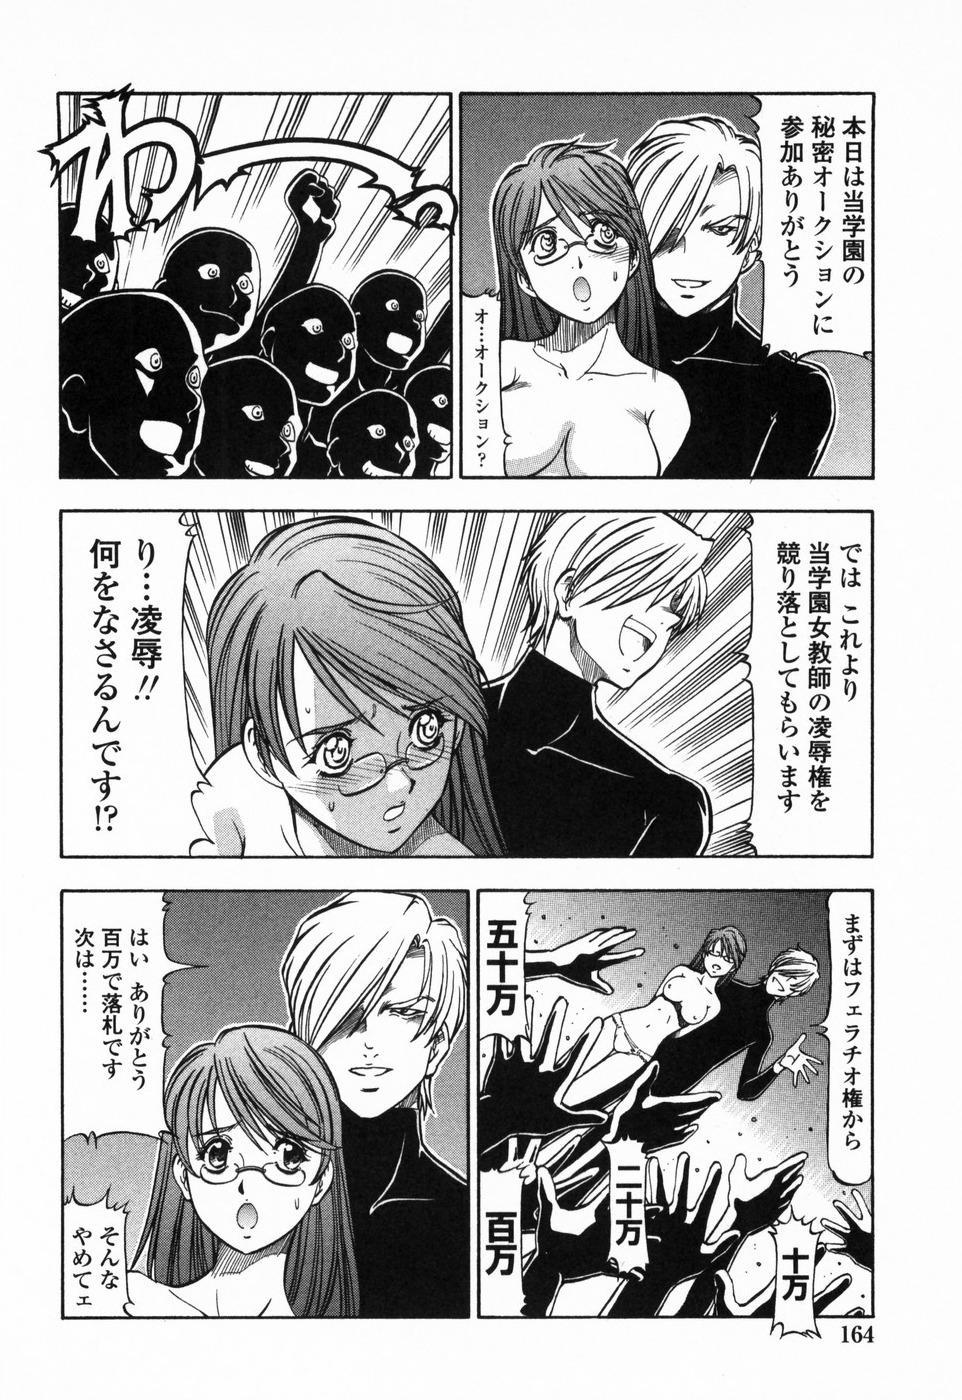 Kichiku Houteishiki - Equation of brutal person 170